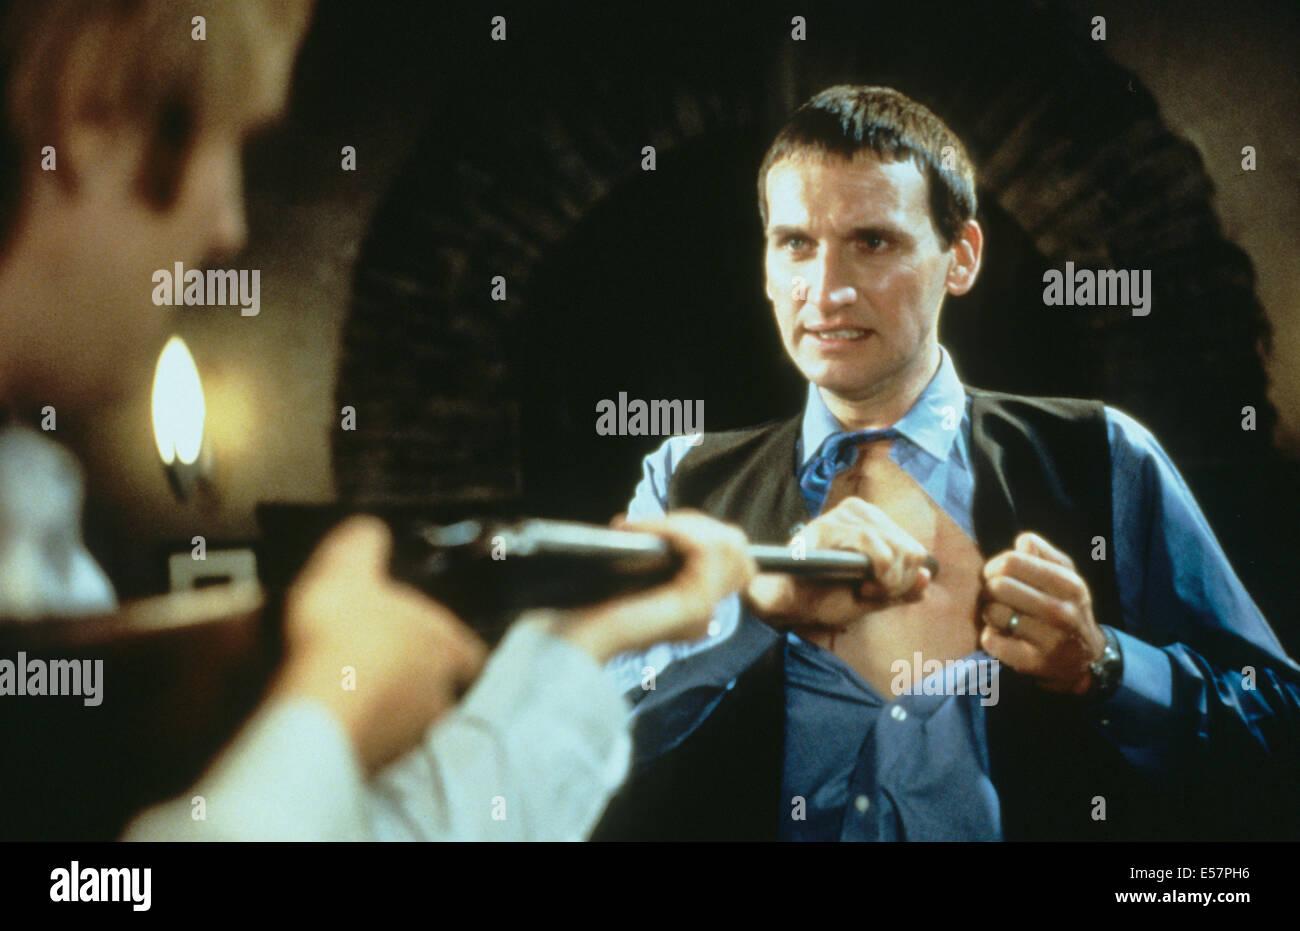 HEART 1999 Granada film with Christopher Ecclestone - Stock Image